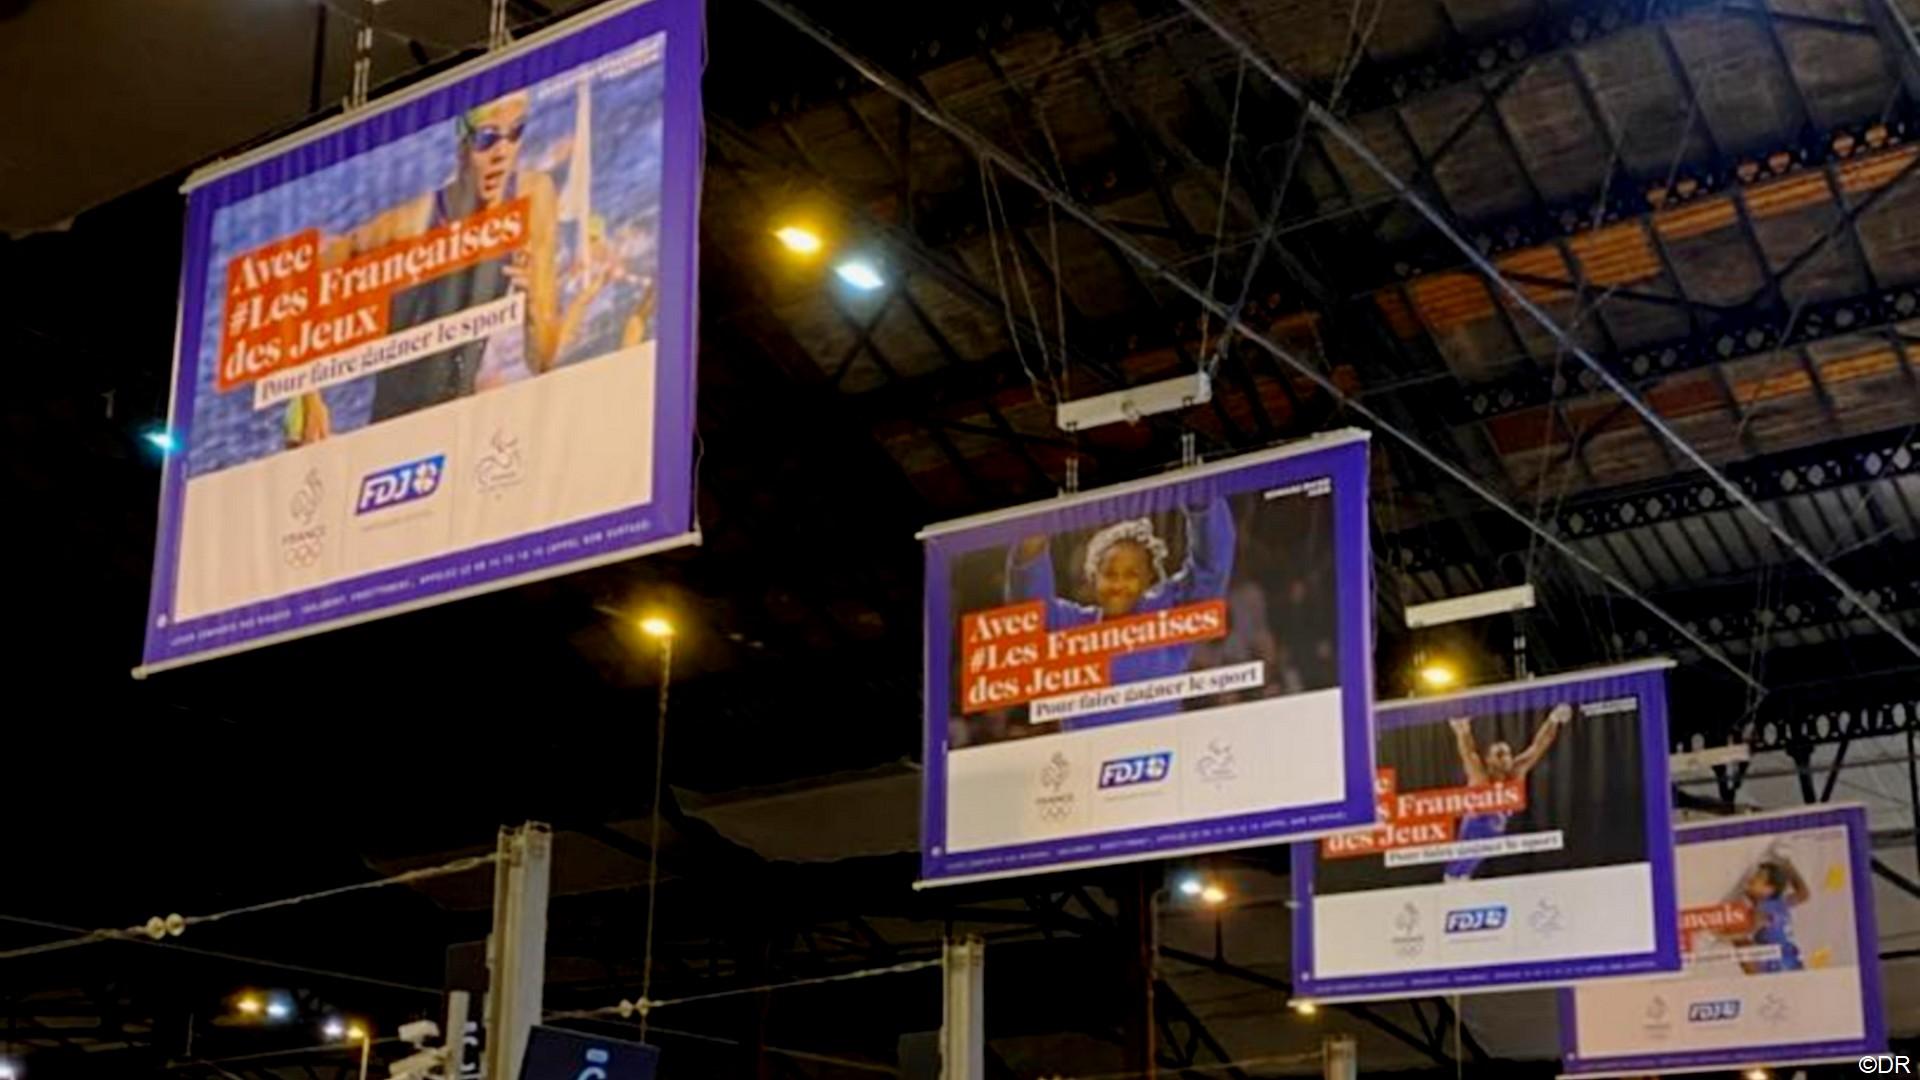 FDJ Tokyo 2020 Campgne affichage Gare de Lyon